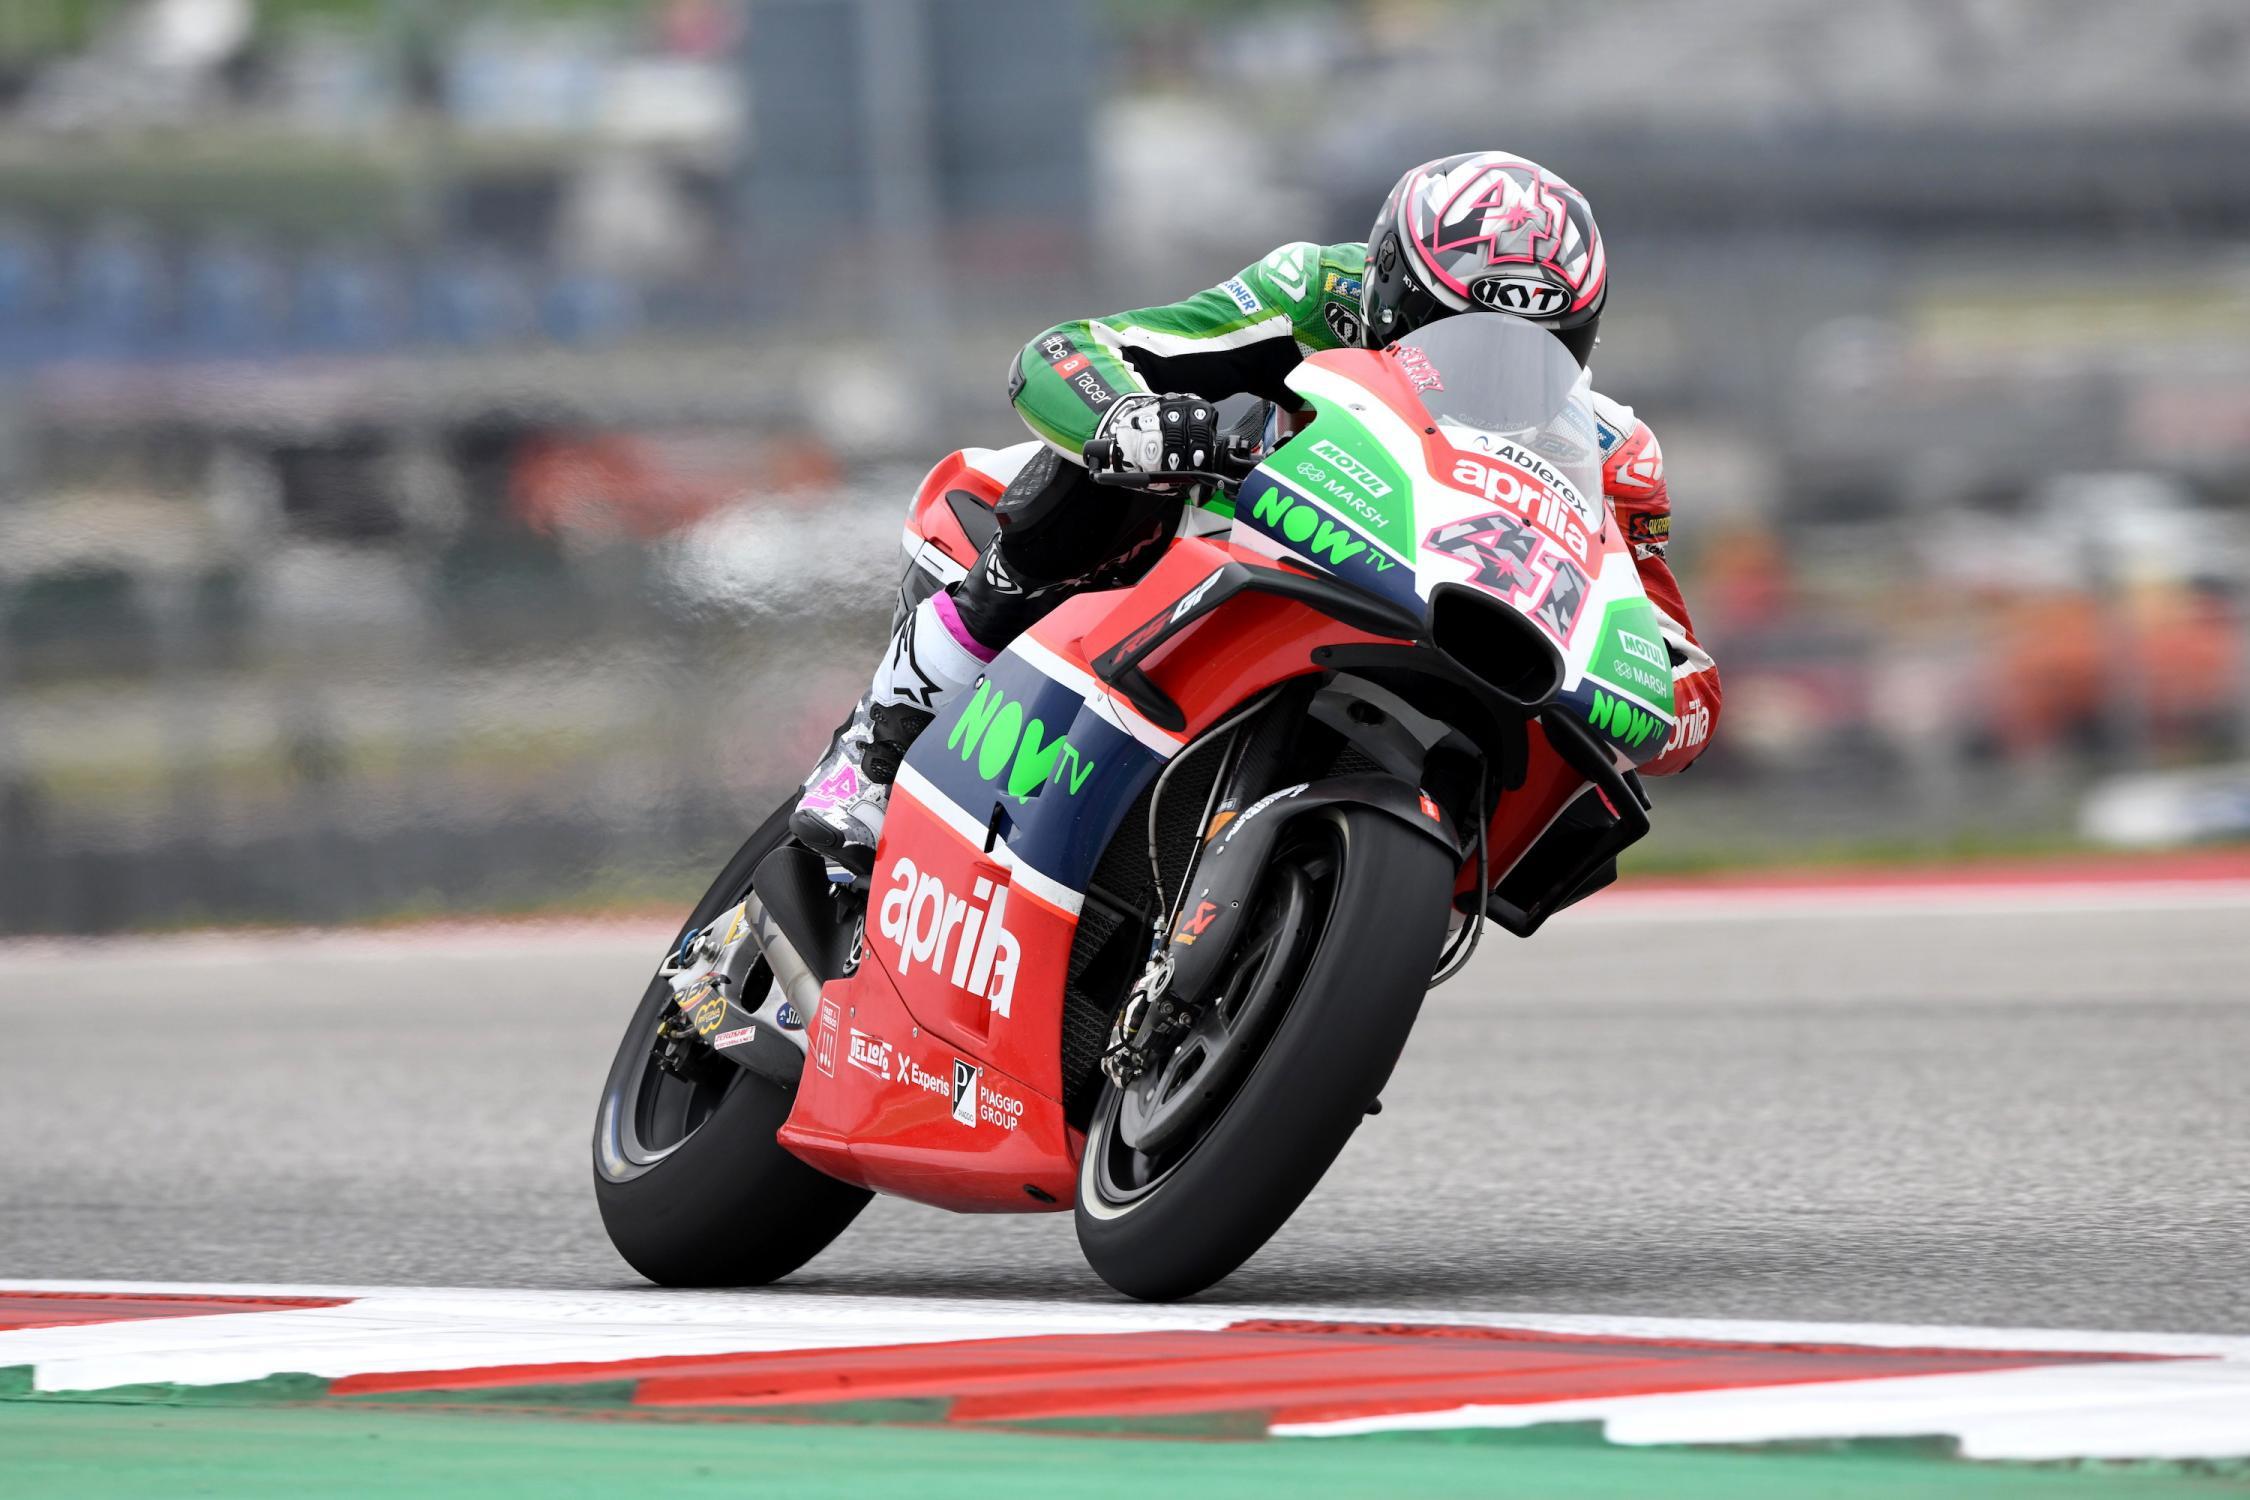 Aleix Espargaro (Foto: Laman Resmi MotoGP)